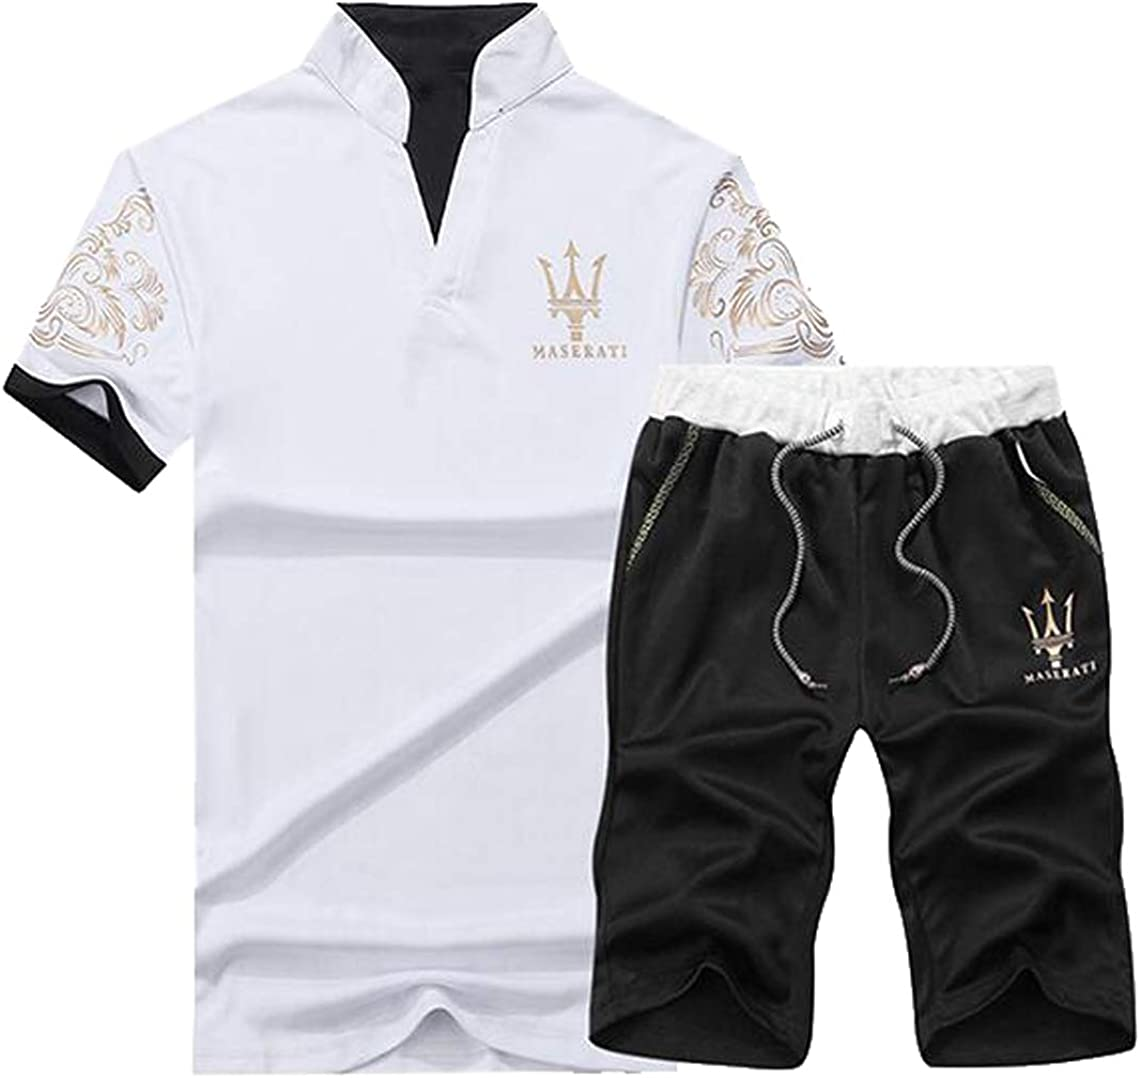 Fensajomon Men 2 Piece Casual V Neck Print T-Shirt and Drawstring Shorts Sports Tracksuits